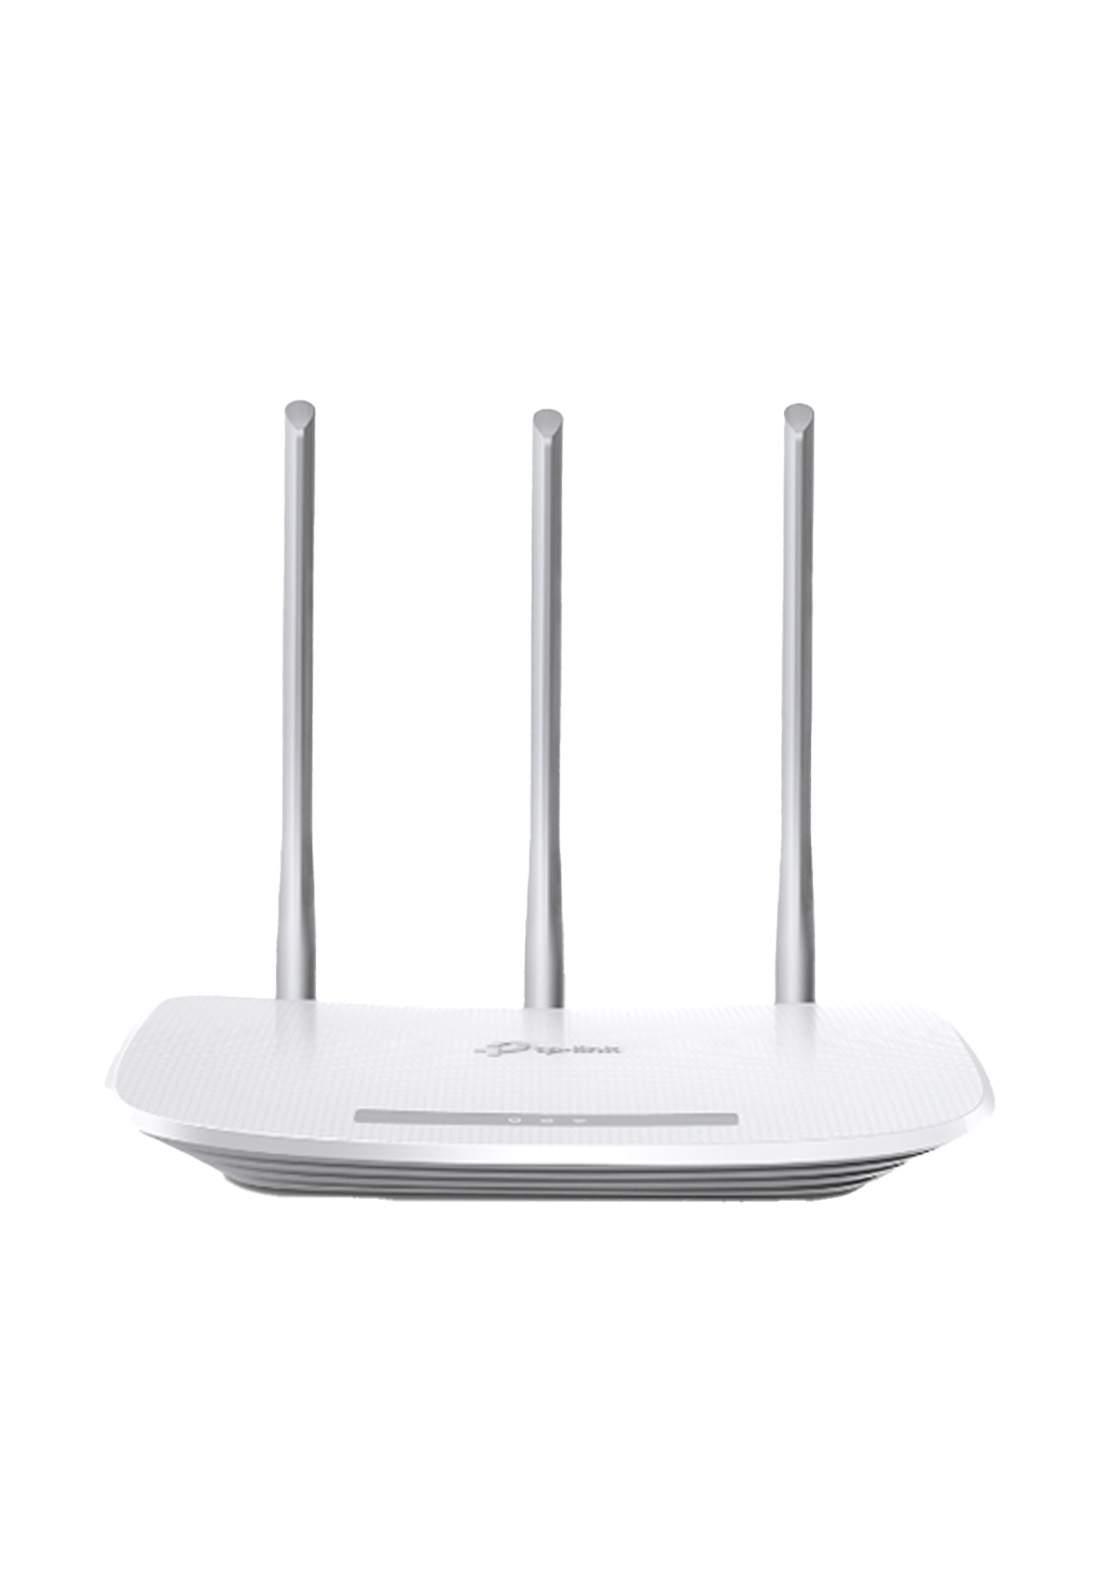 Tp-Link TL-WR845N V4 300Mbps Wireless N Router - White